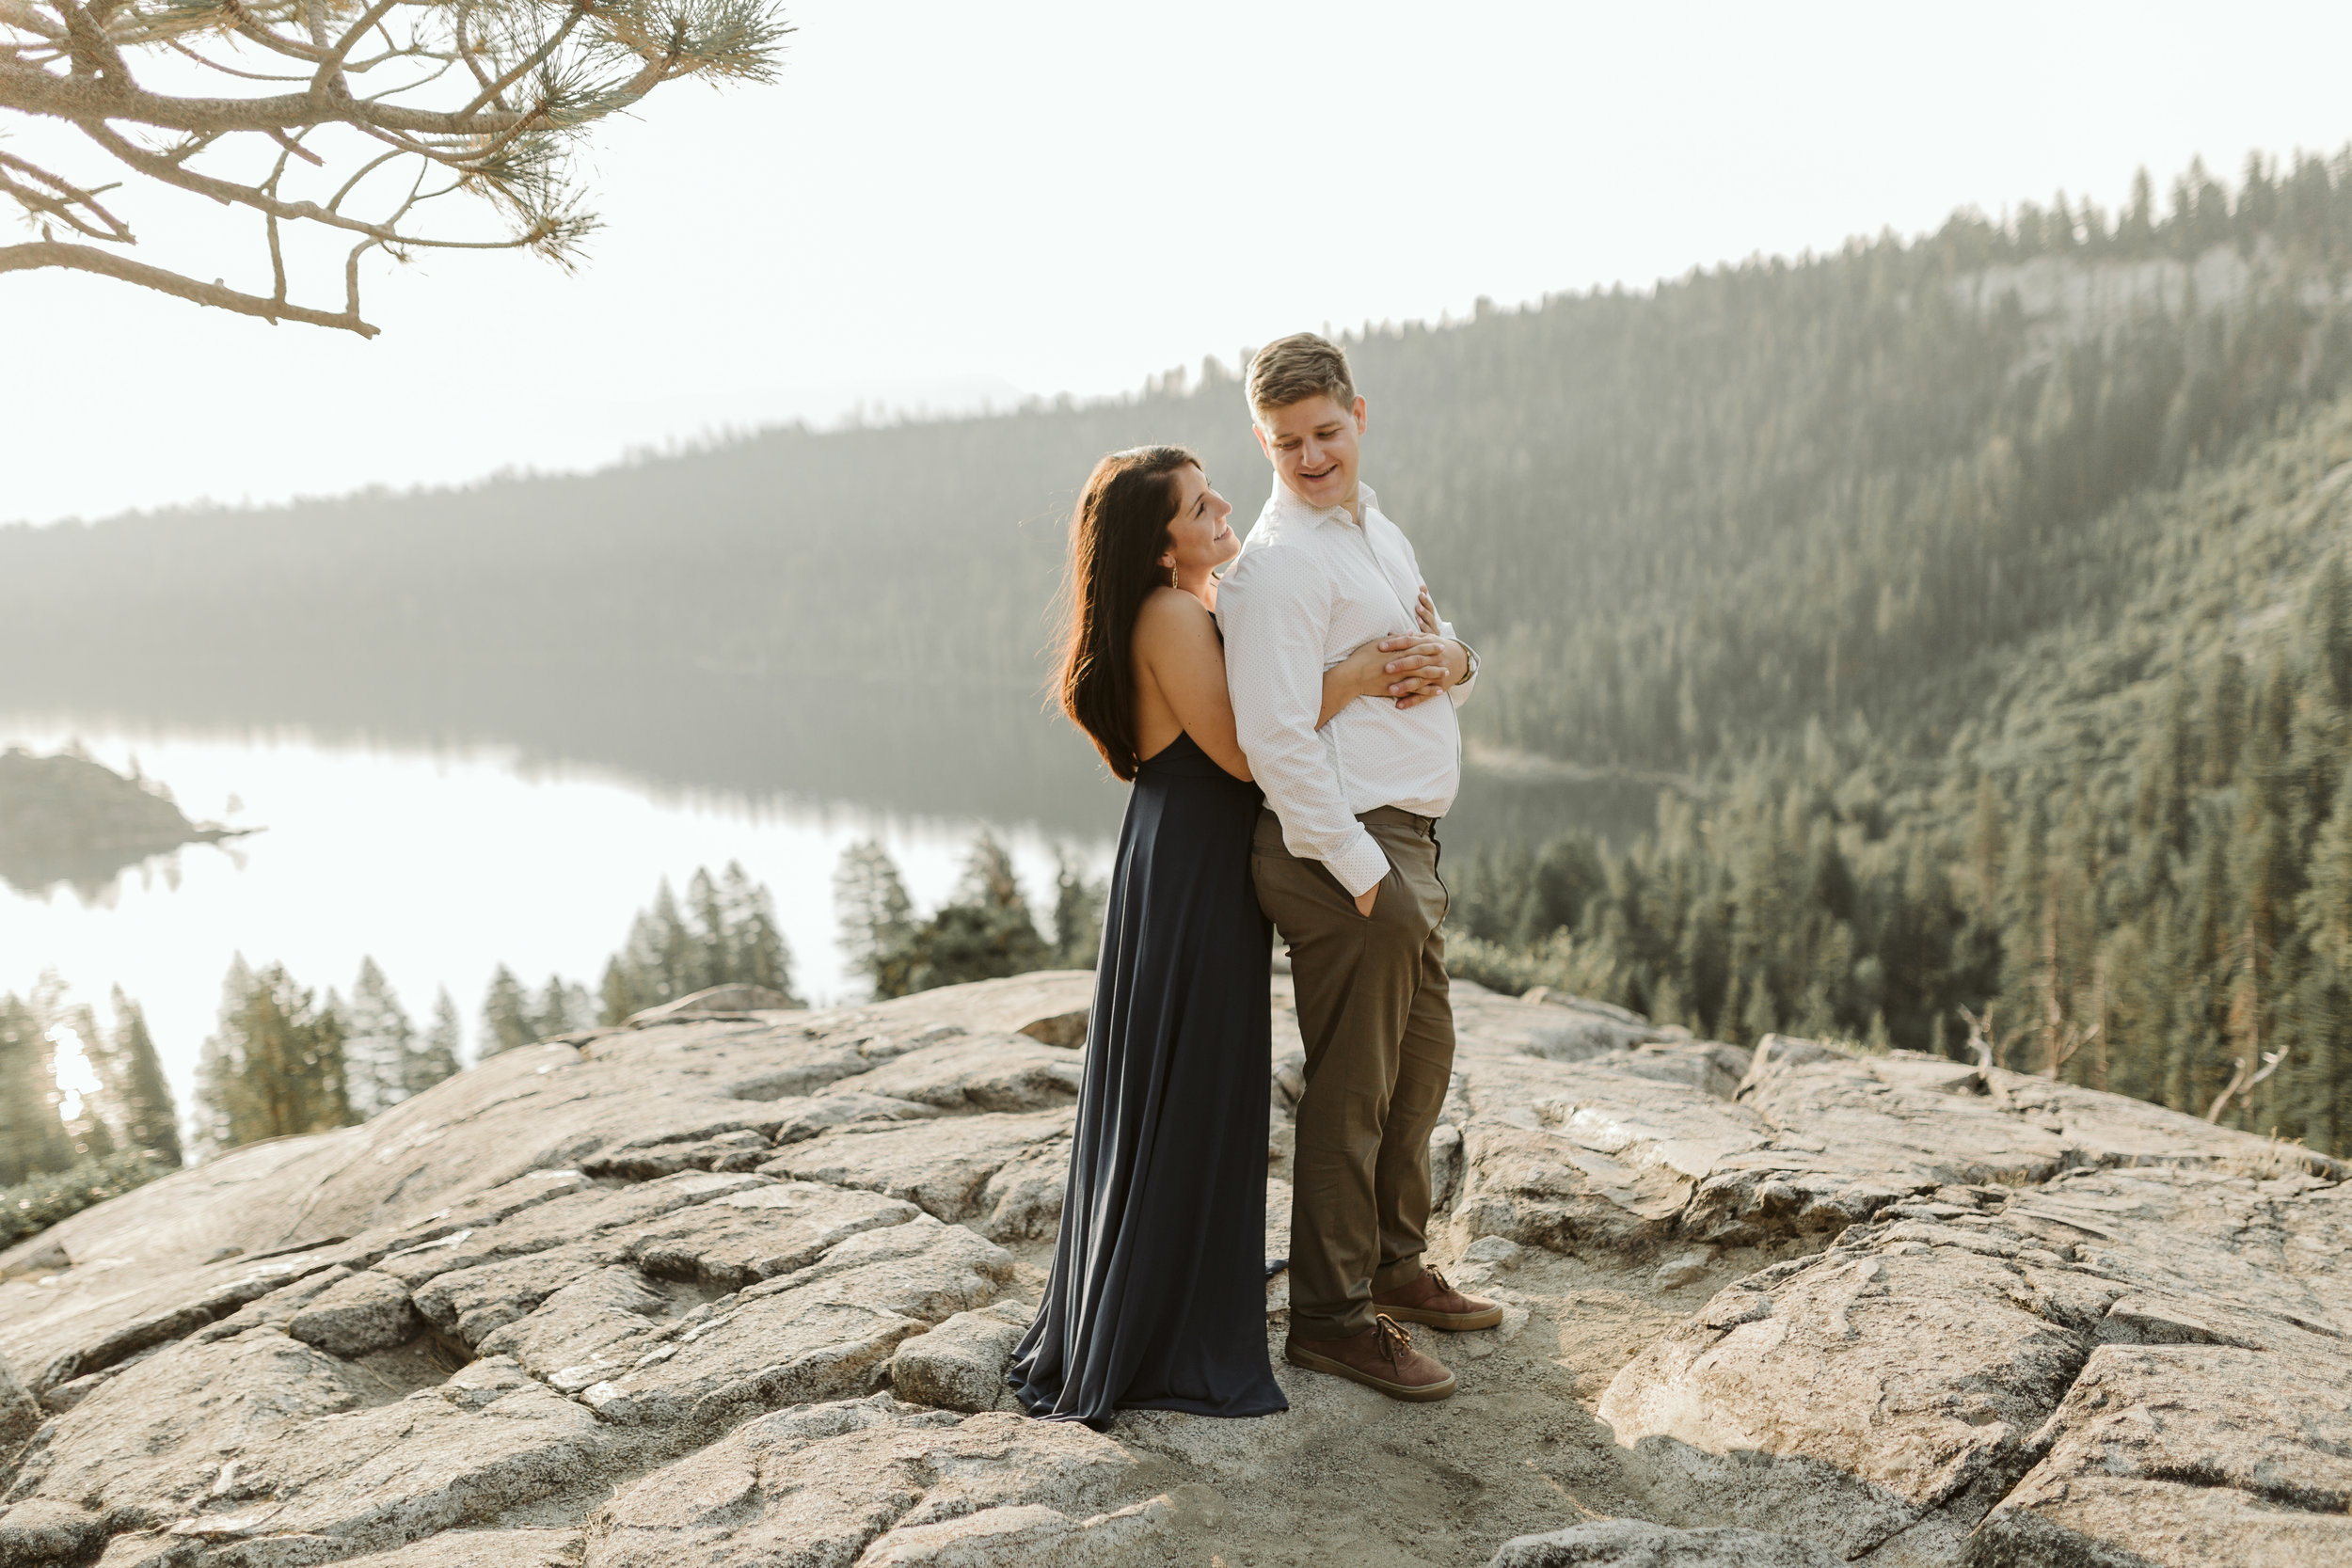 nicole-daacke-photography-lake-tahoe-sunrise-summer-adventure-engagement-photos-nevada-wedding-elopement-photographer-golden-emerald-bay-light-pine-trees-summer-vibe-fun-carefree-authentic-love-46.jpg